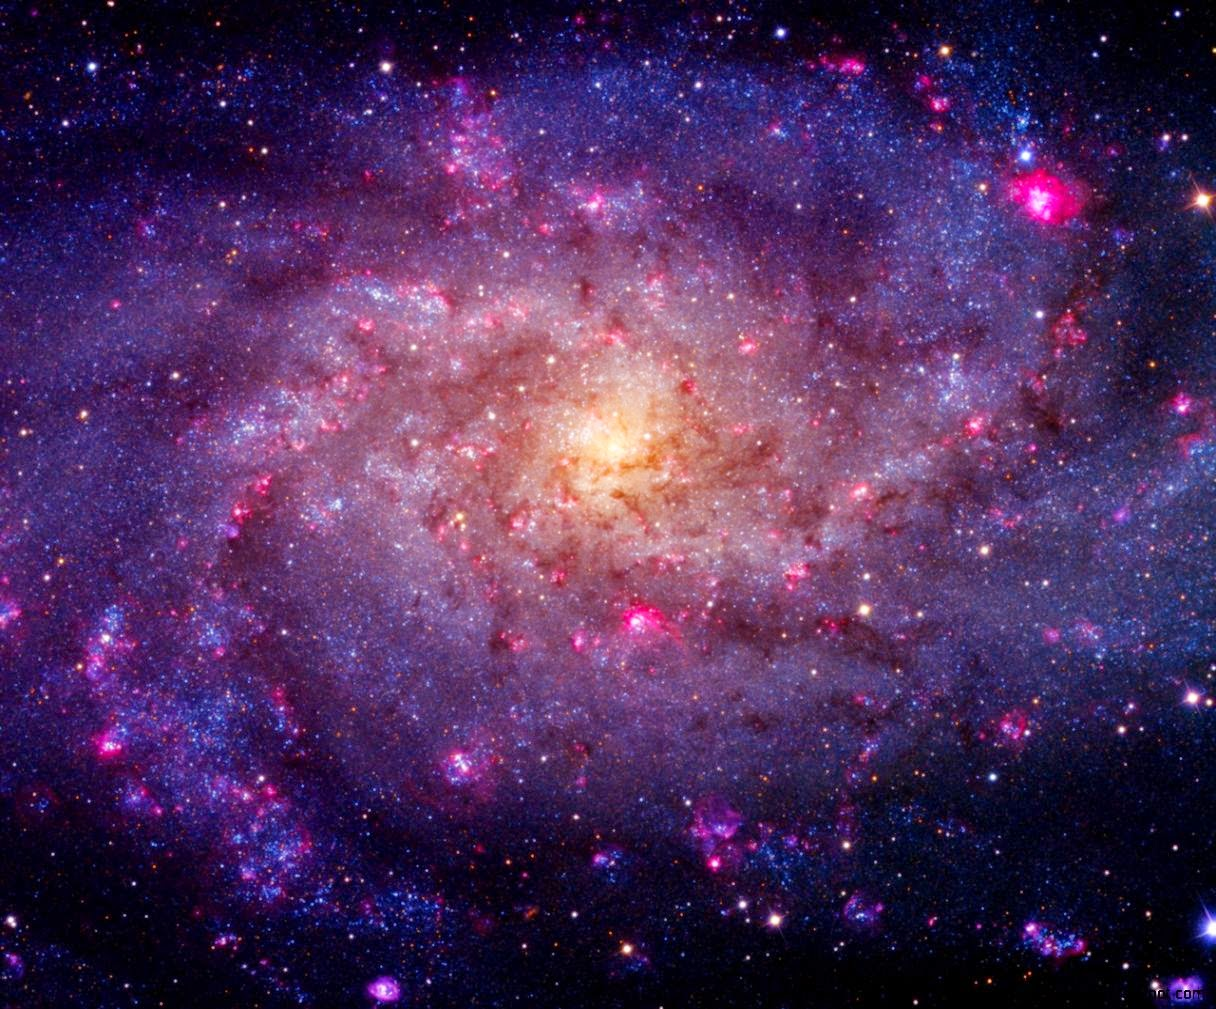 Cute Infinity Wallpaper: Galaxy Infinity Wallpaper